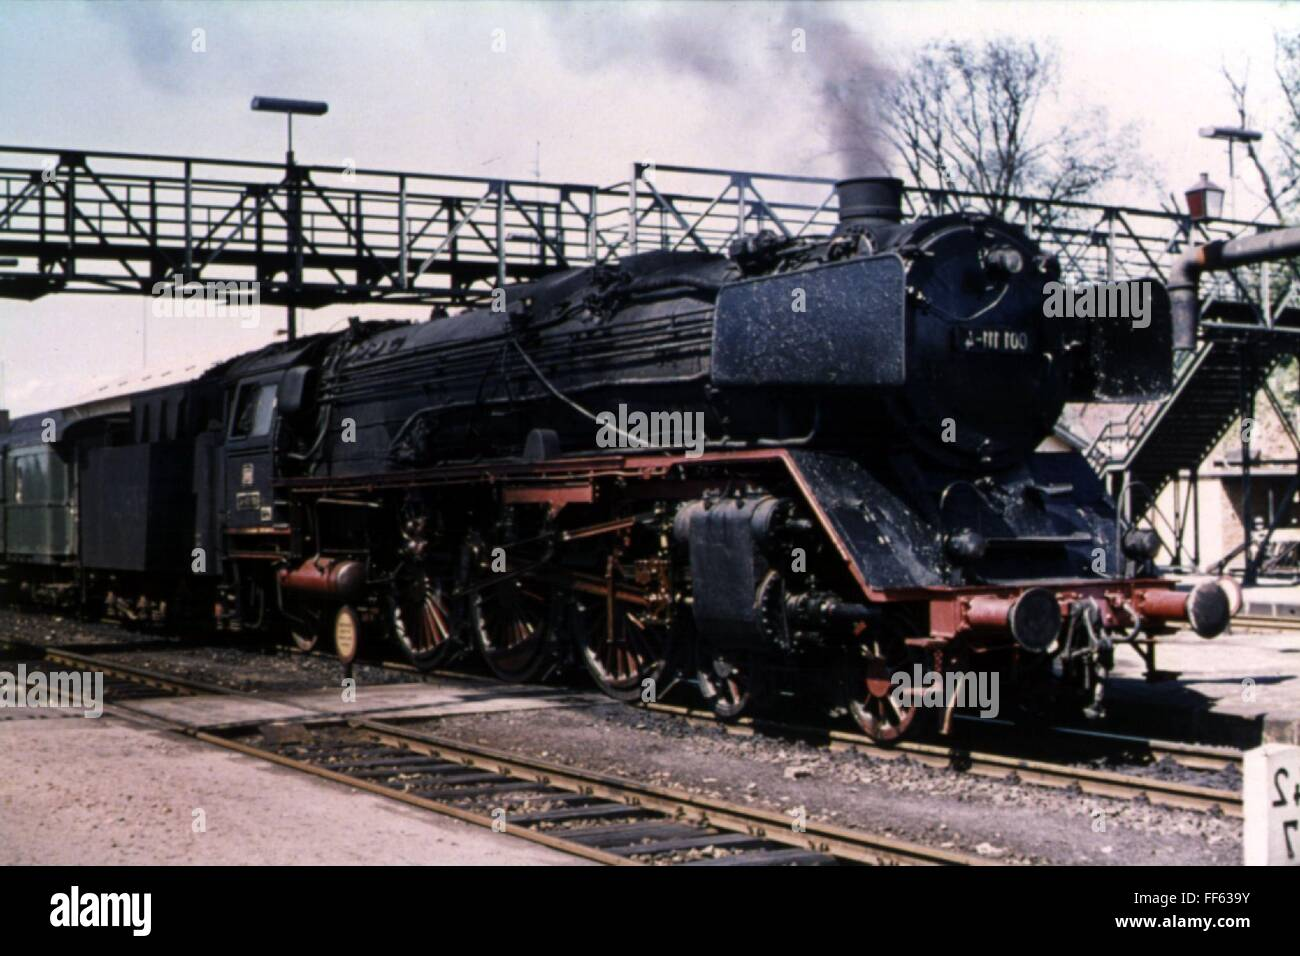 Trasporti / trasporto ferroviario, locomotive, Lok 001111, Bw Hof, VOR P 3228 in Schwandorf, 14.6.1973, 1970s, 70s, Foto Stock